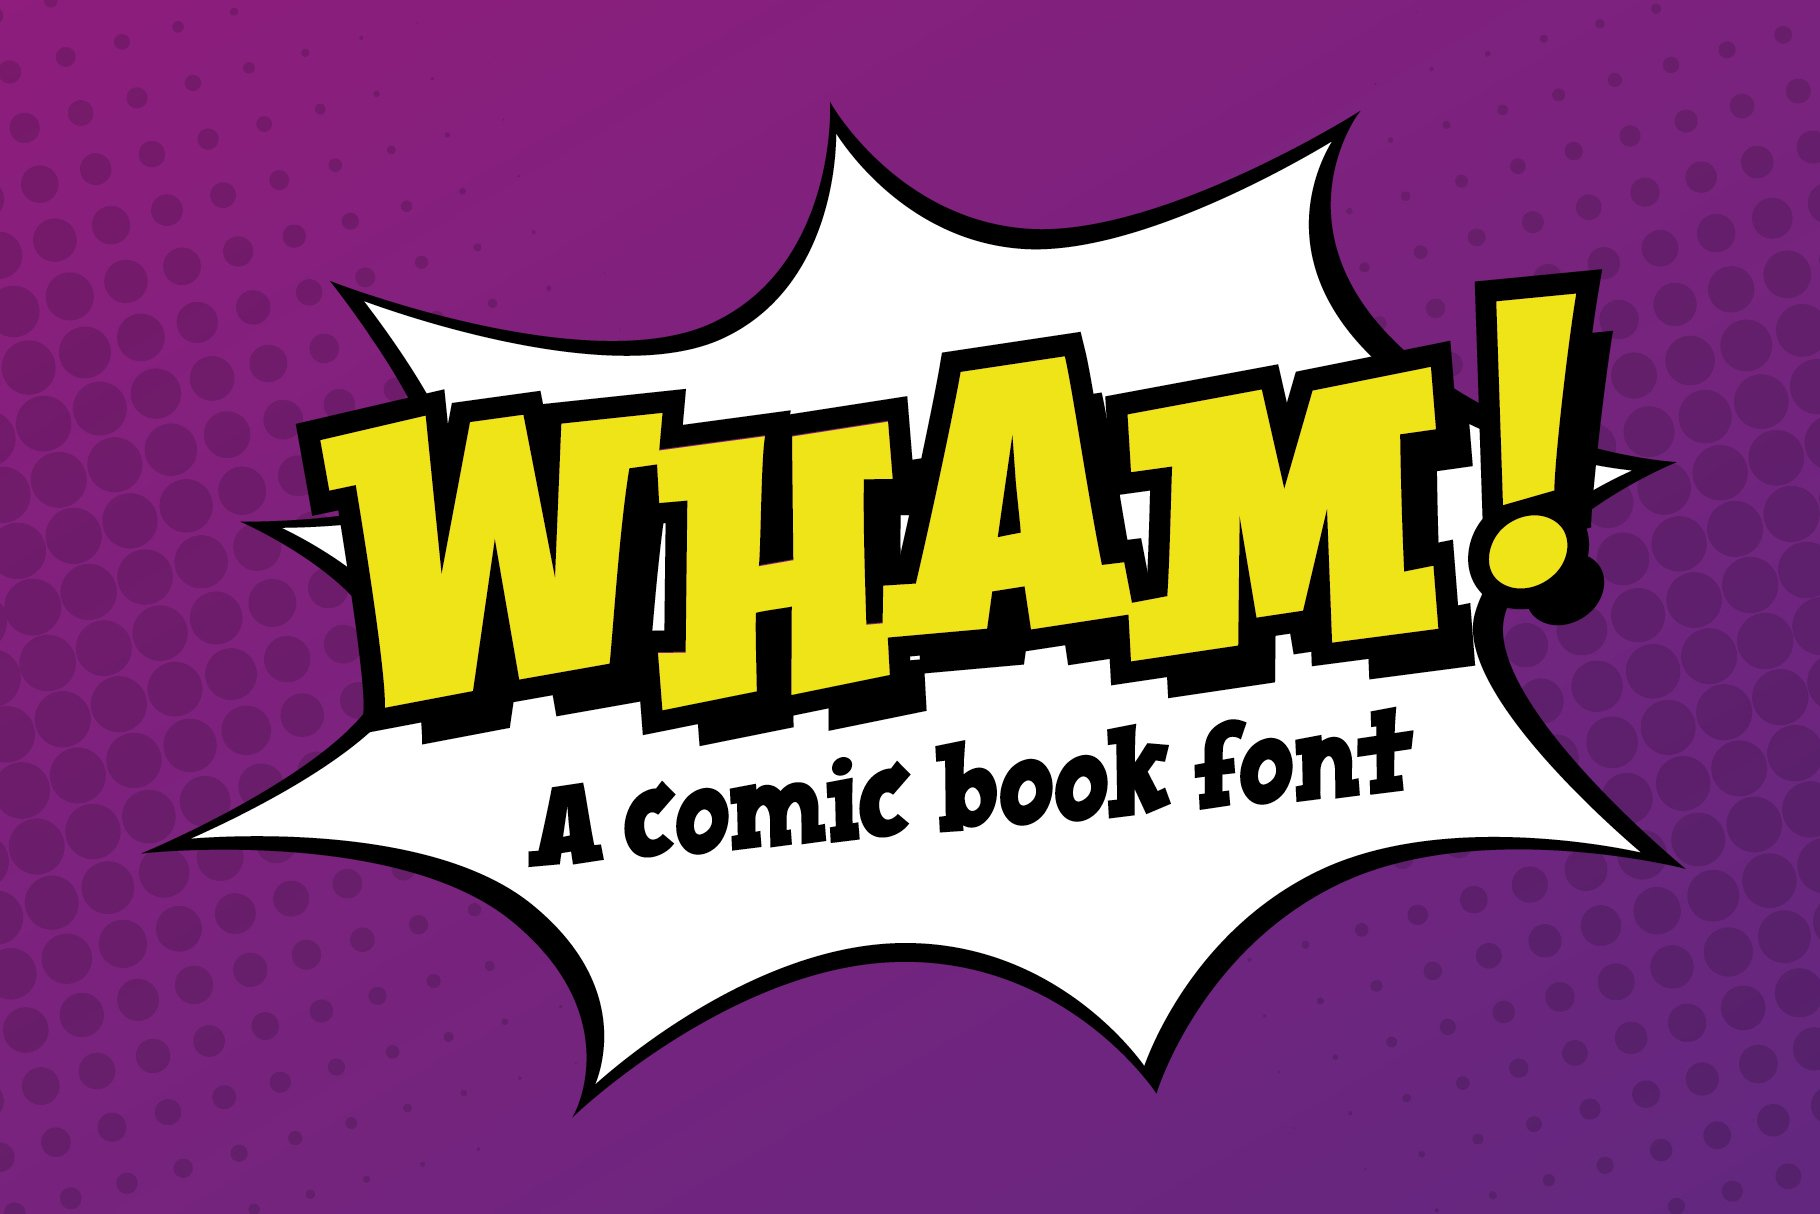 Wham! comic book cartoon font example image 2